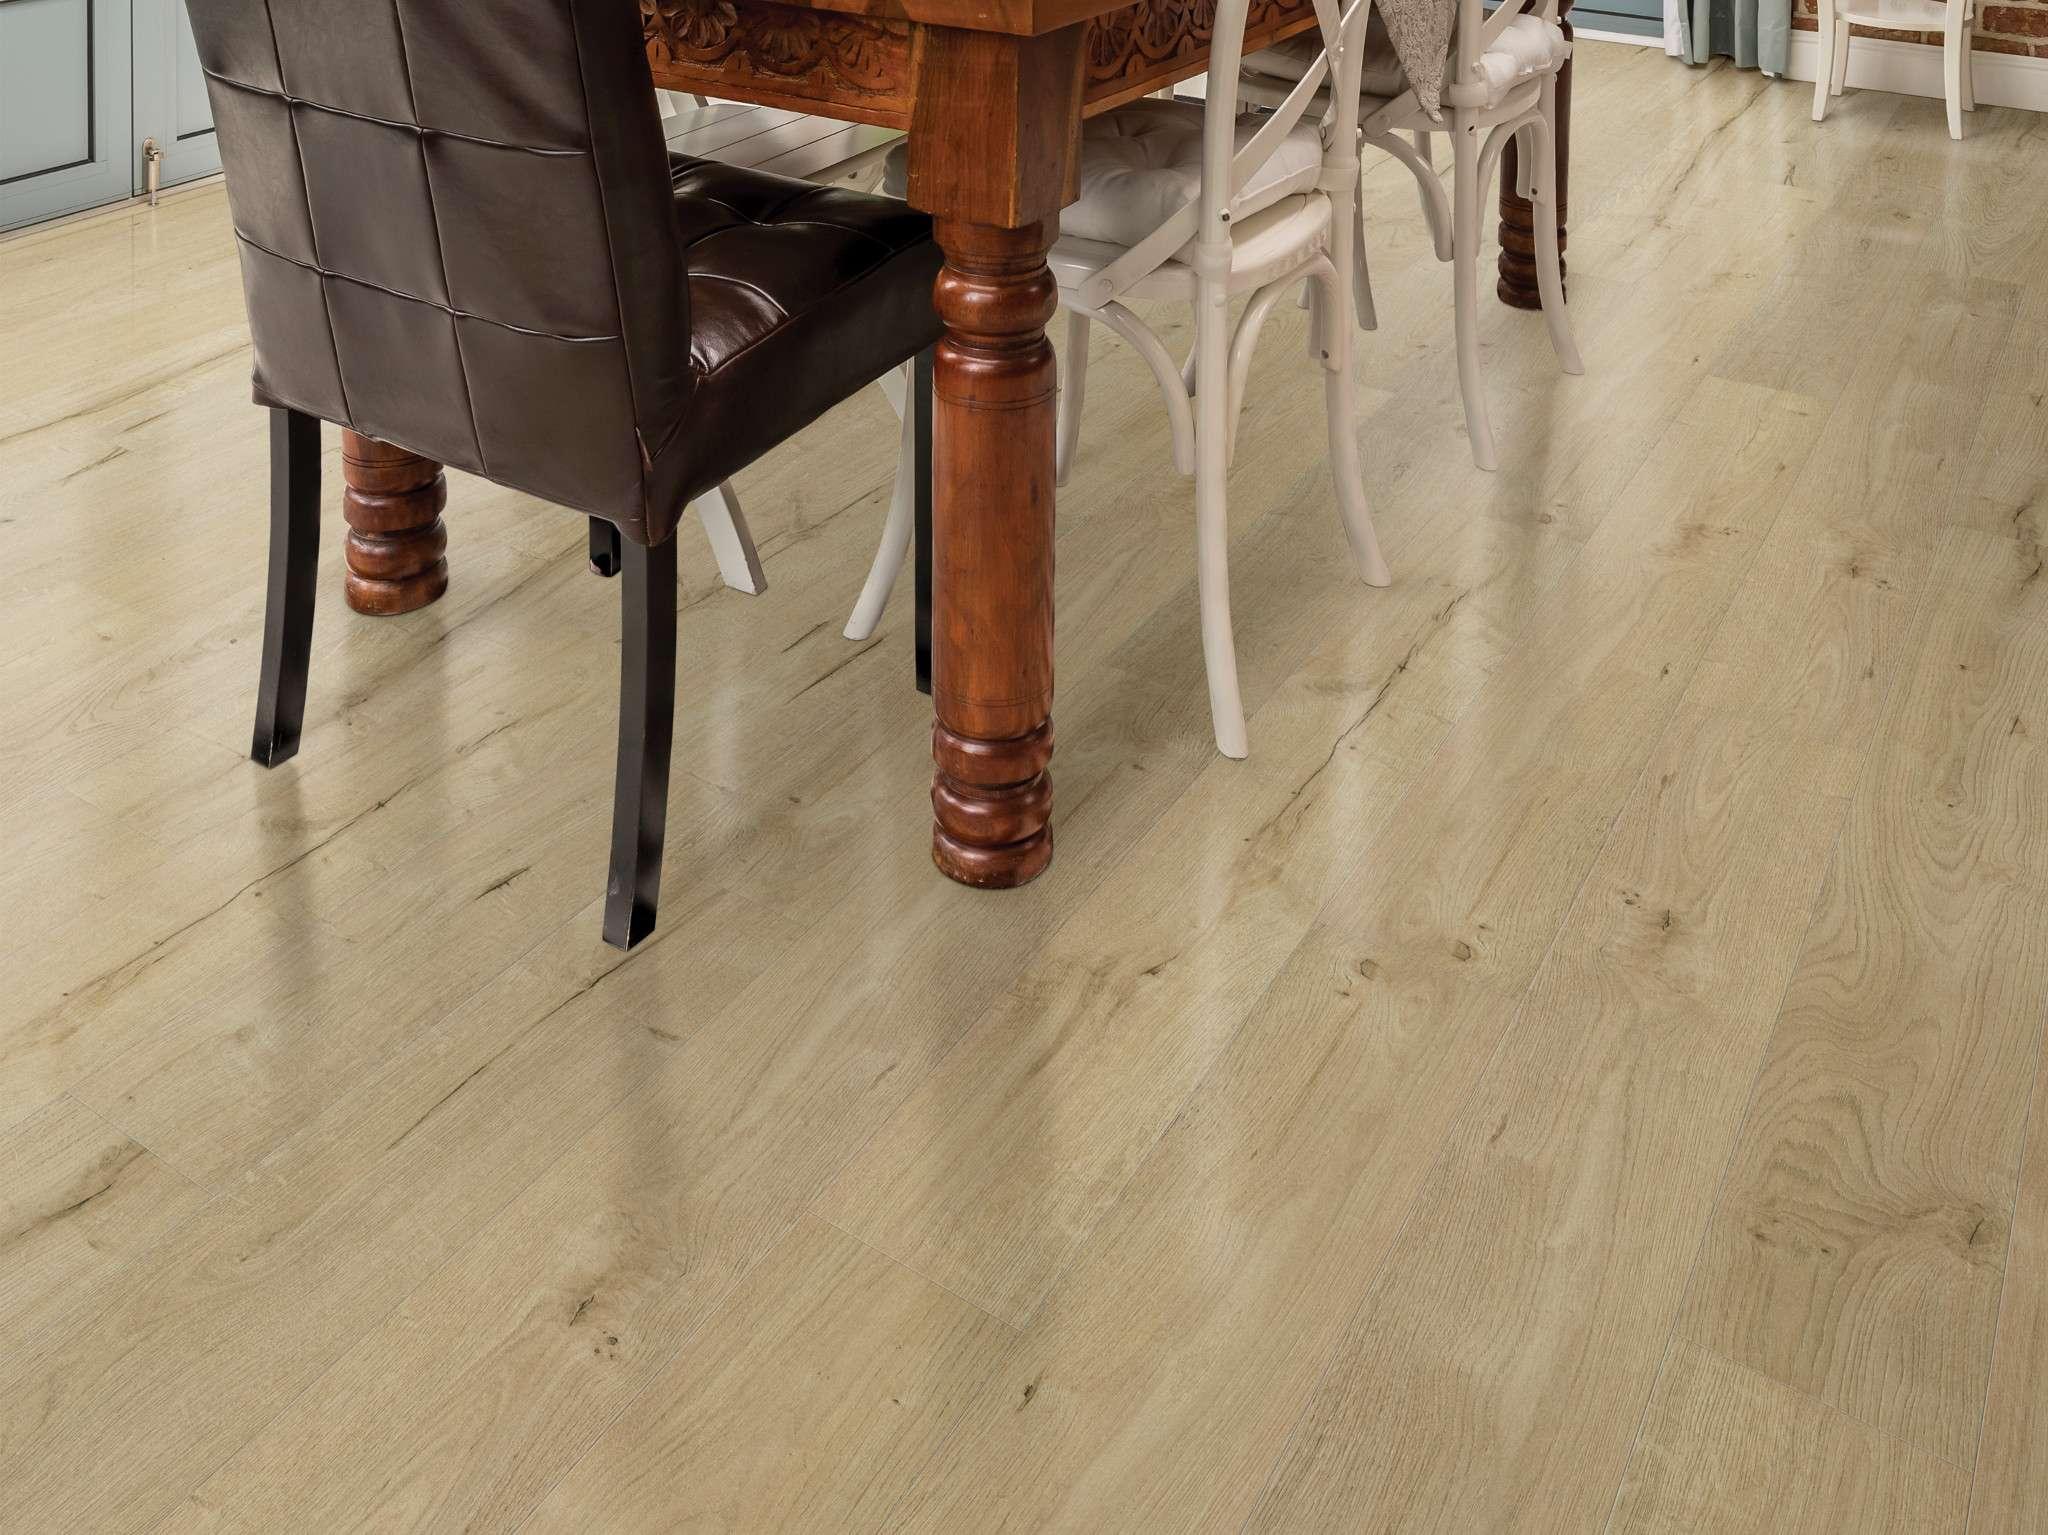 Illumination Sl431 Dusk Laminates, Shaw Laminate Flooring Versalock